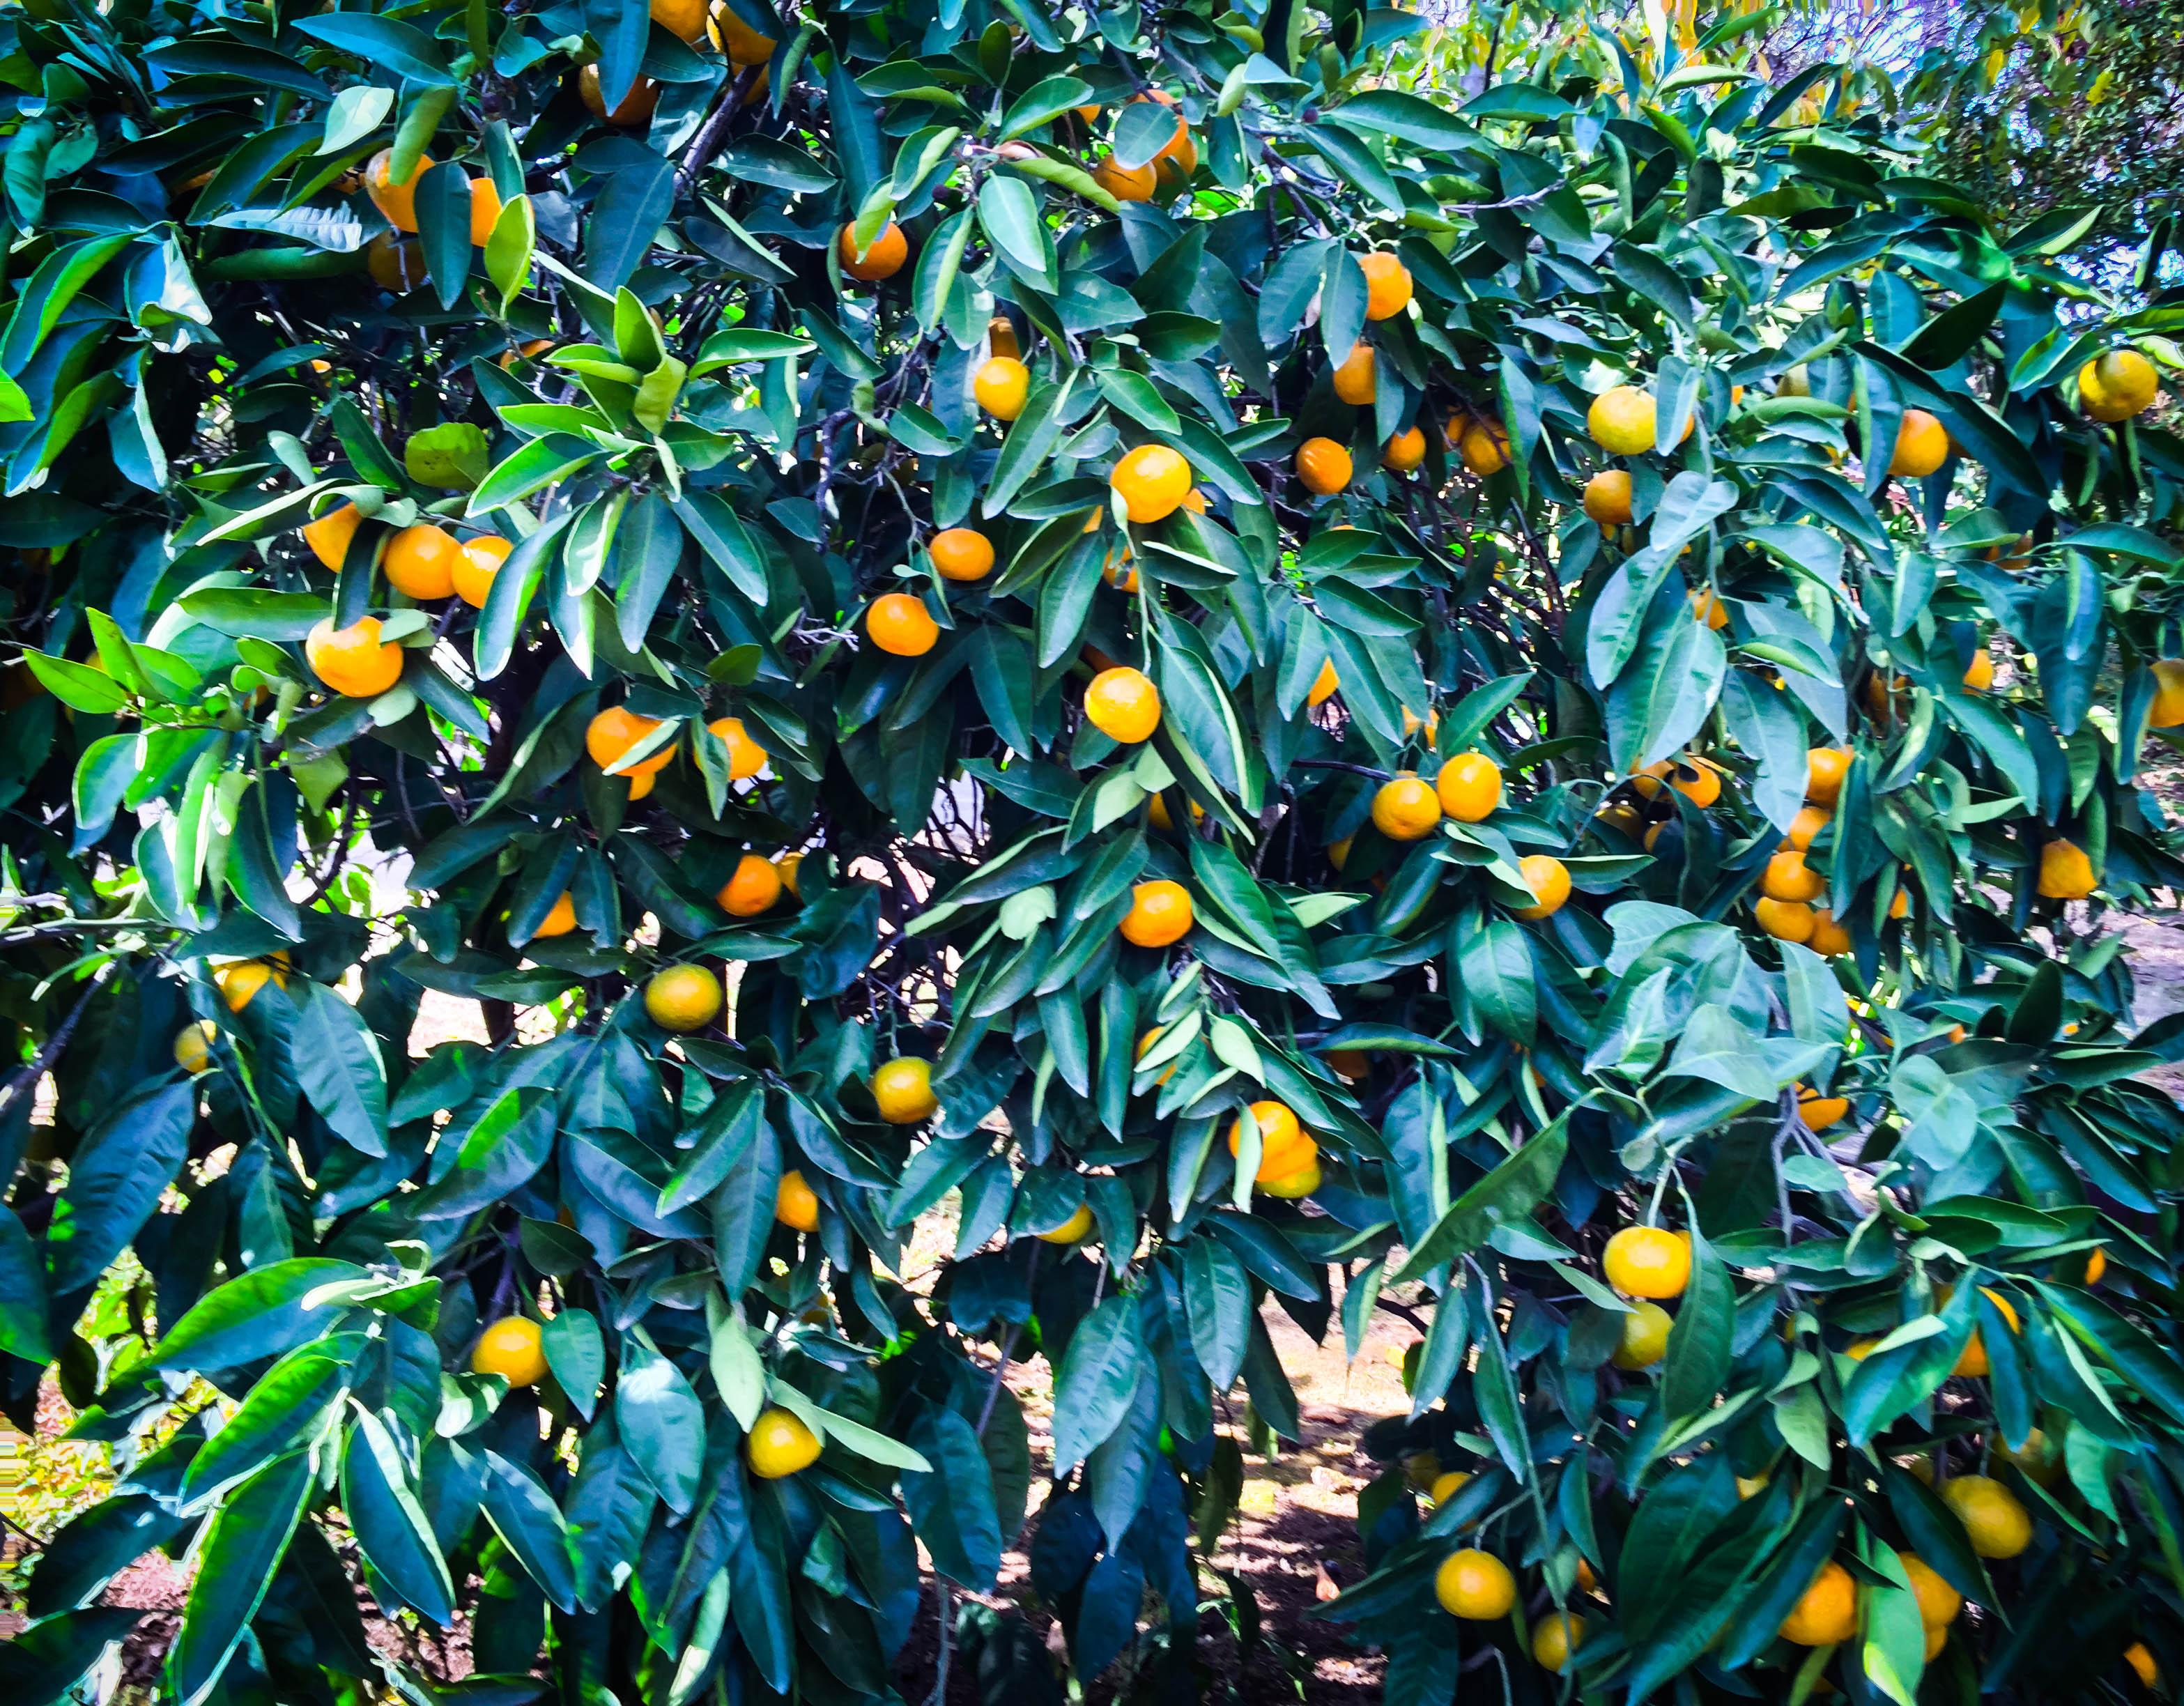 mandarins lr.jpg